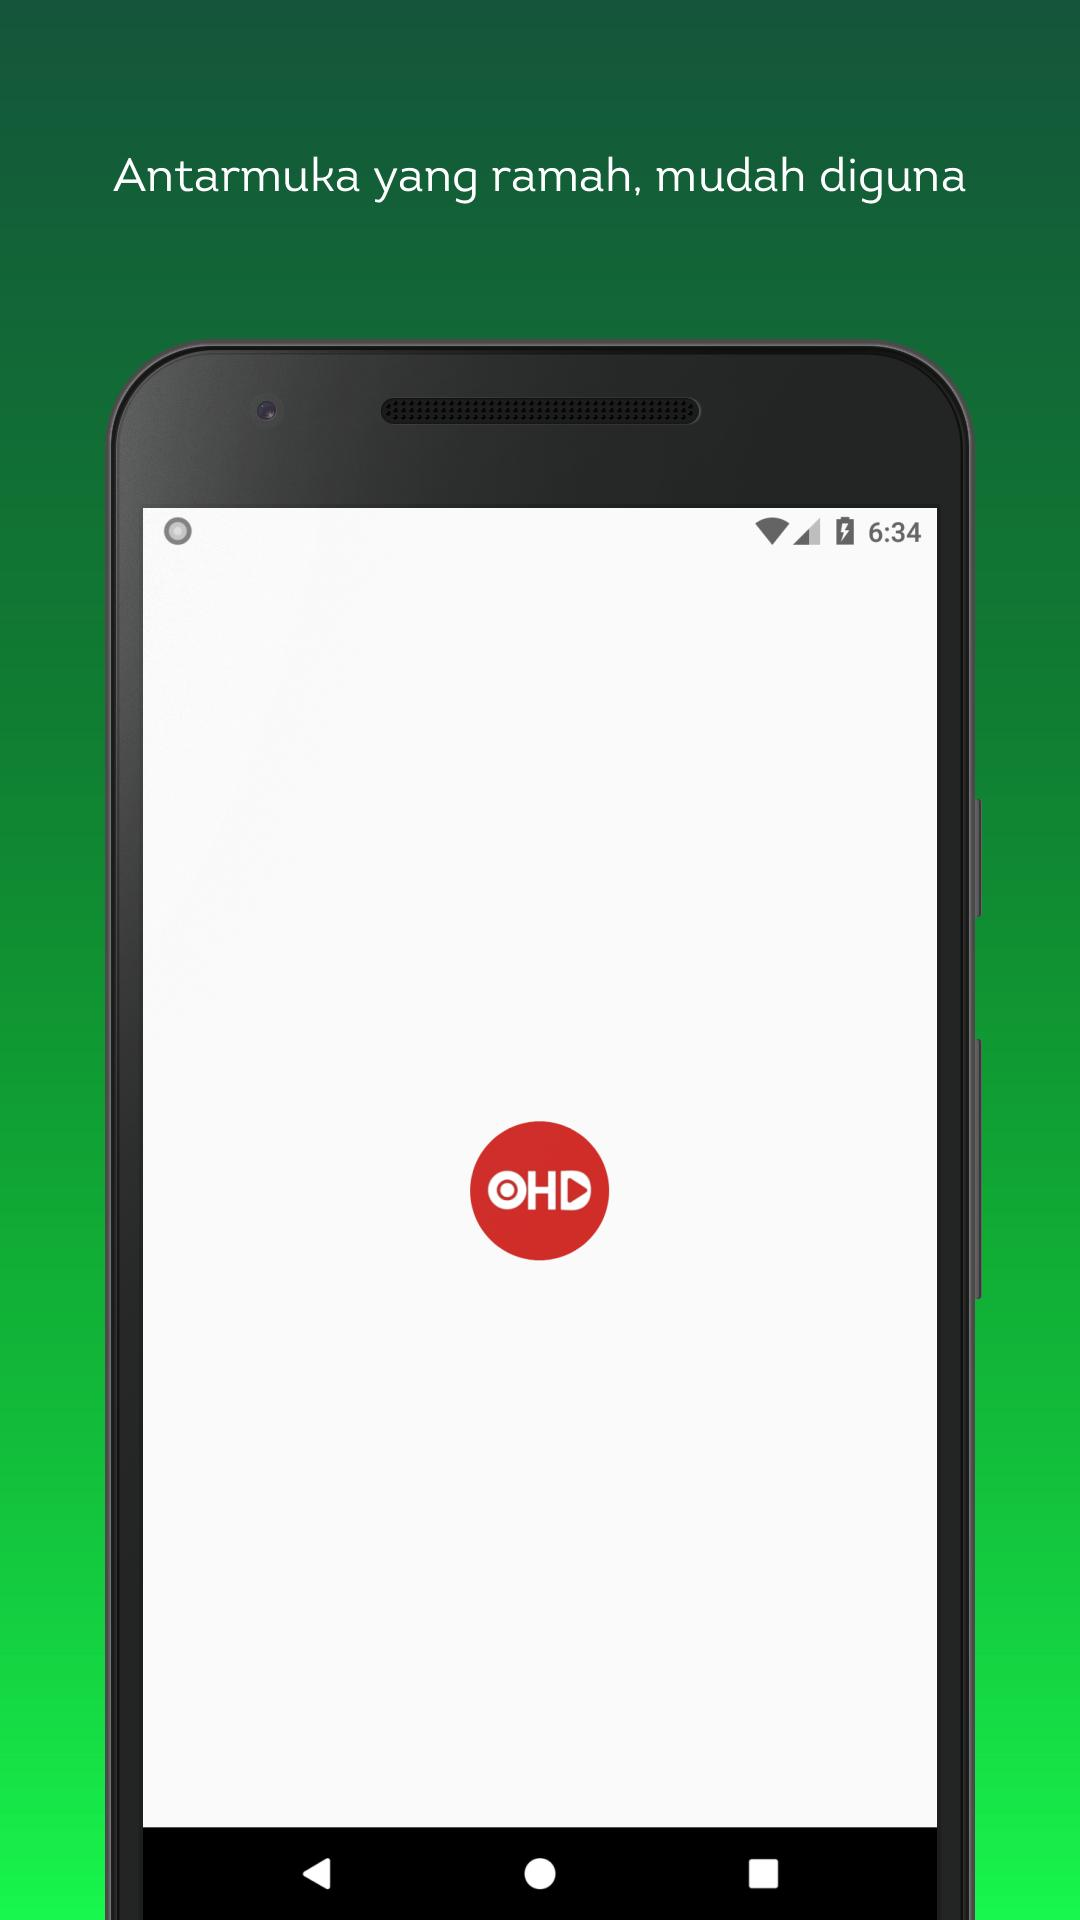 F21 Nonton Film Subtitle Indo Nonton Free Hd Fur Android Apk Herunterladen